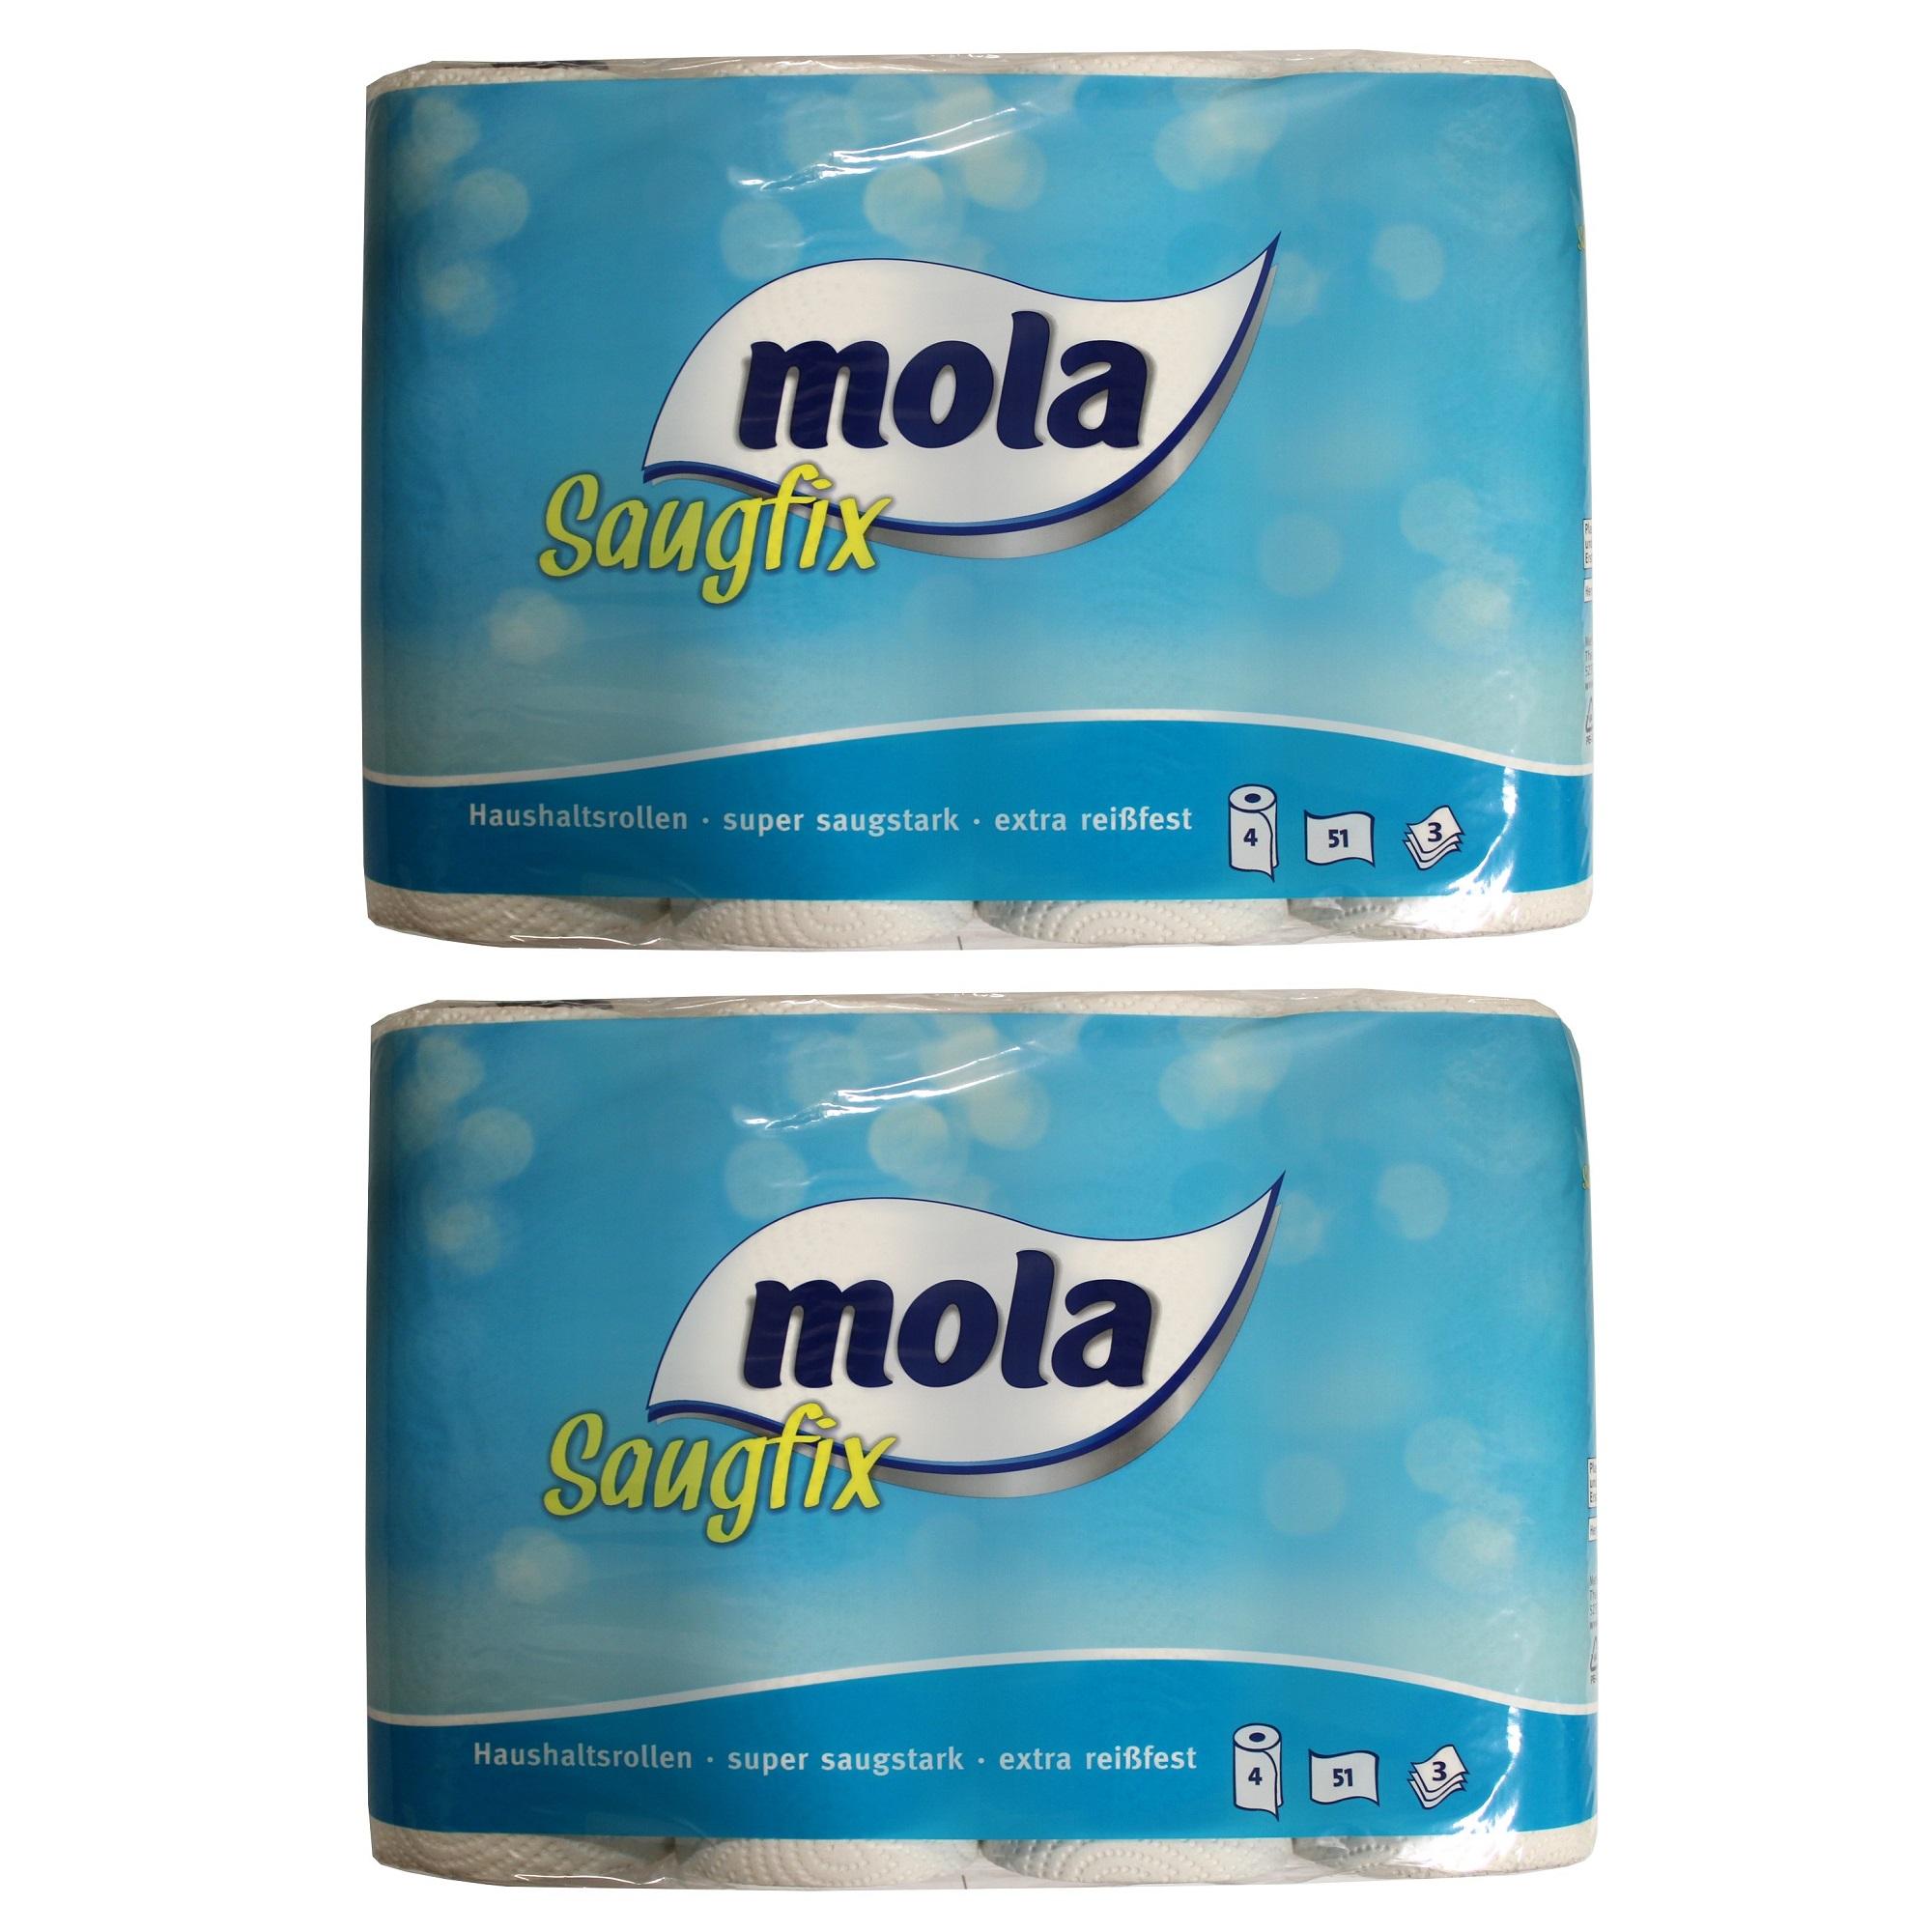 Mola 8x Saugfix Küchenrolle 3-lagig 51 Blatt Küchenpapier